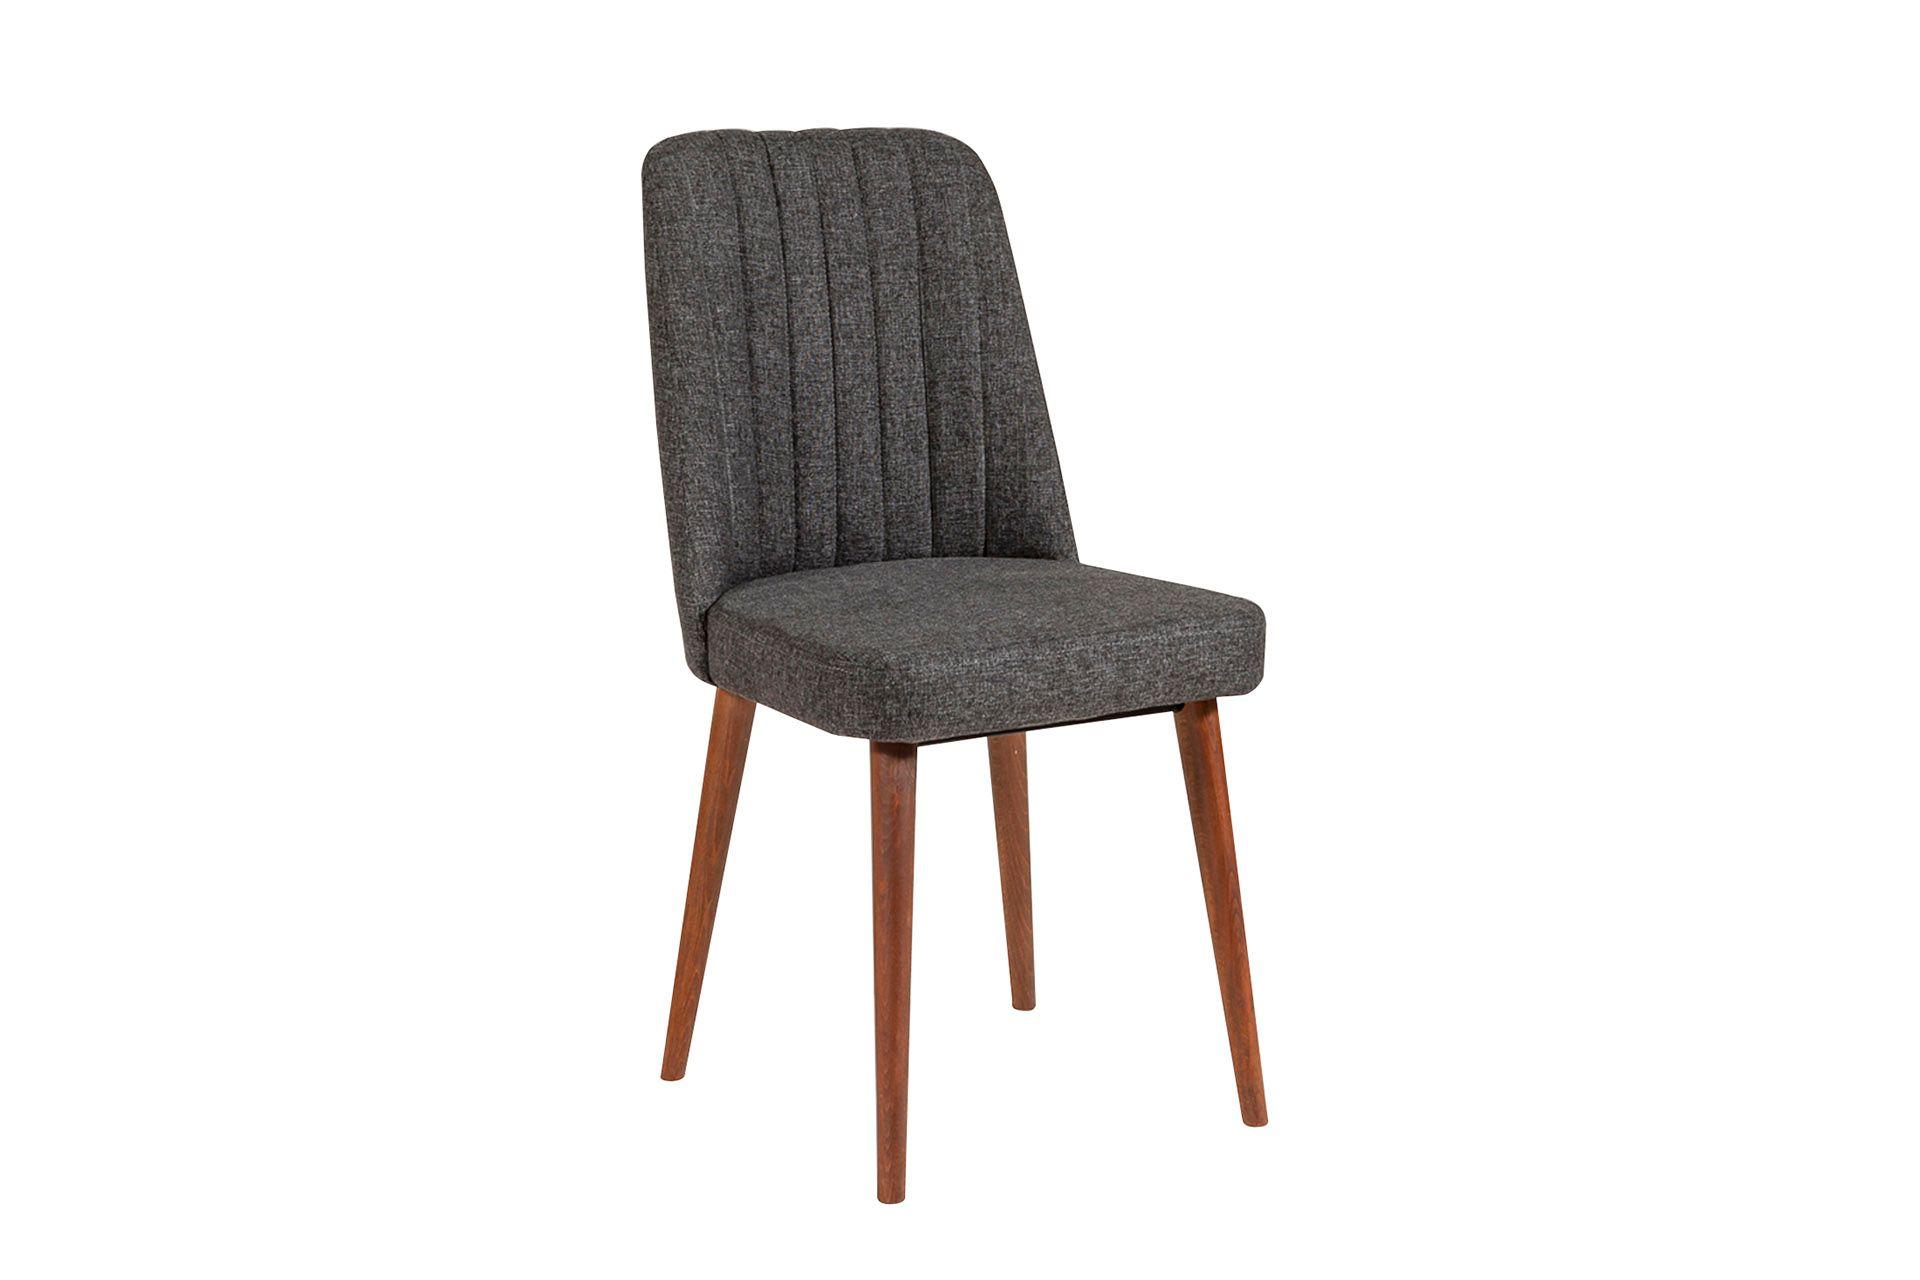 Vina Dining Chair, Dark Grey & Walnut